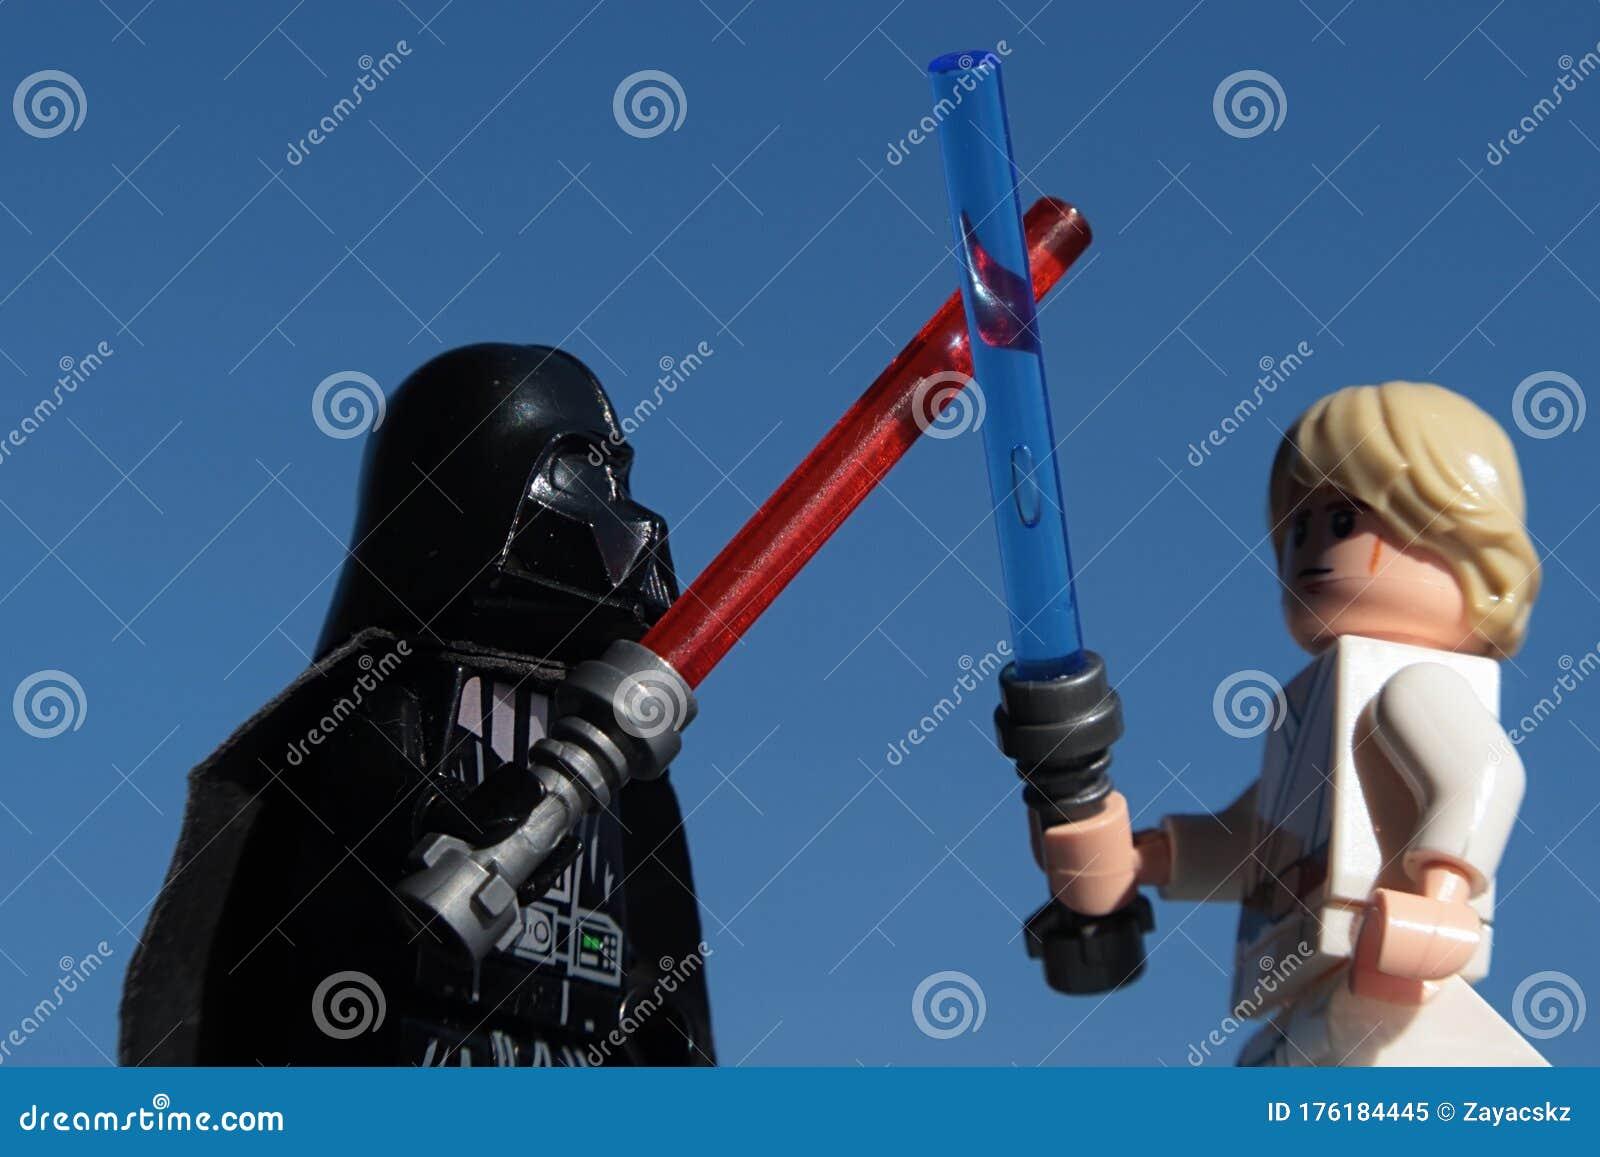 lego star wars figures luke skywalker darth vader fighting lightsabers lego star wars figures luke skywalker 176184445